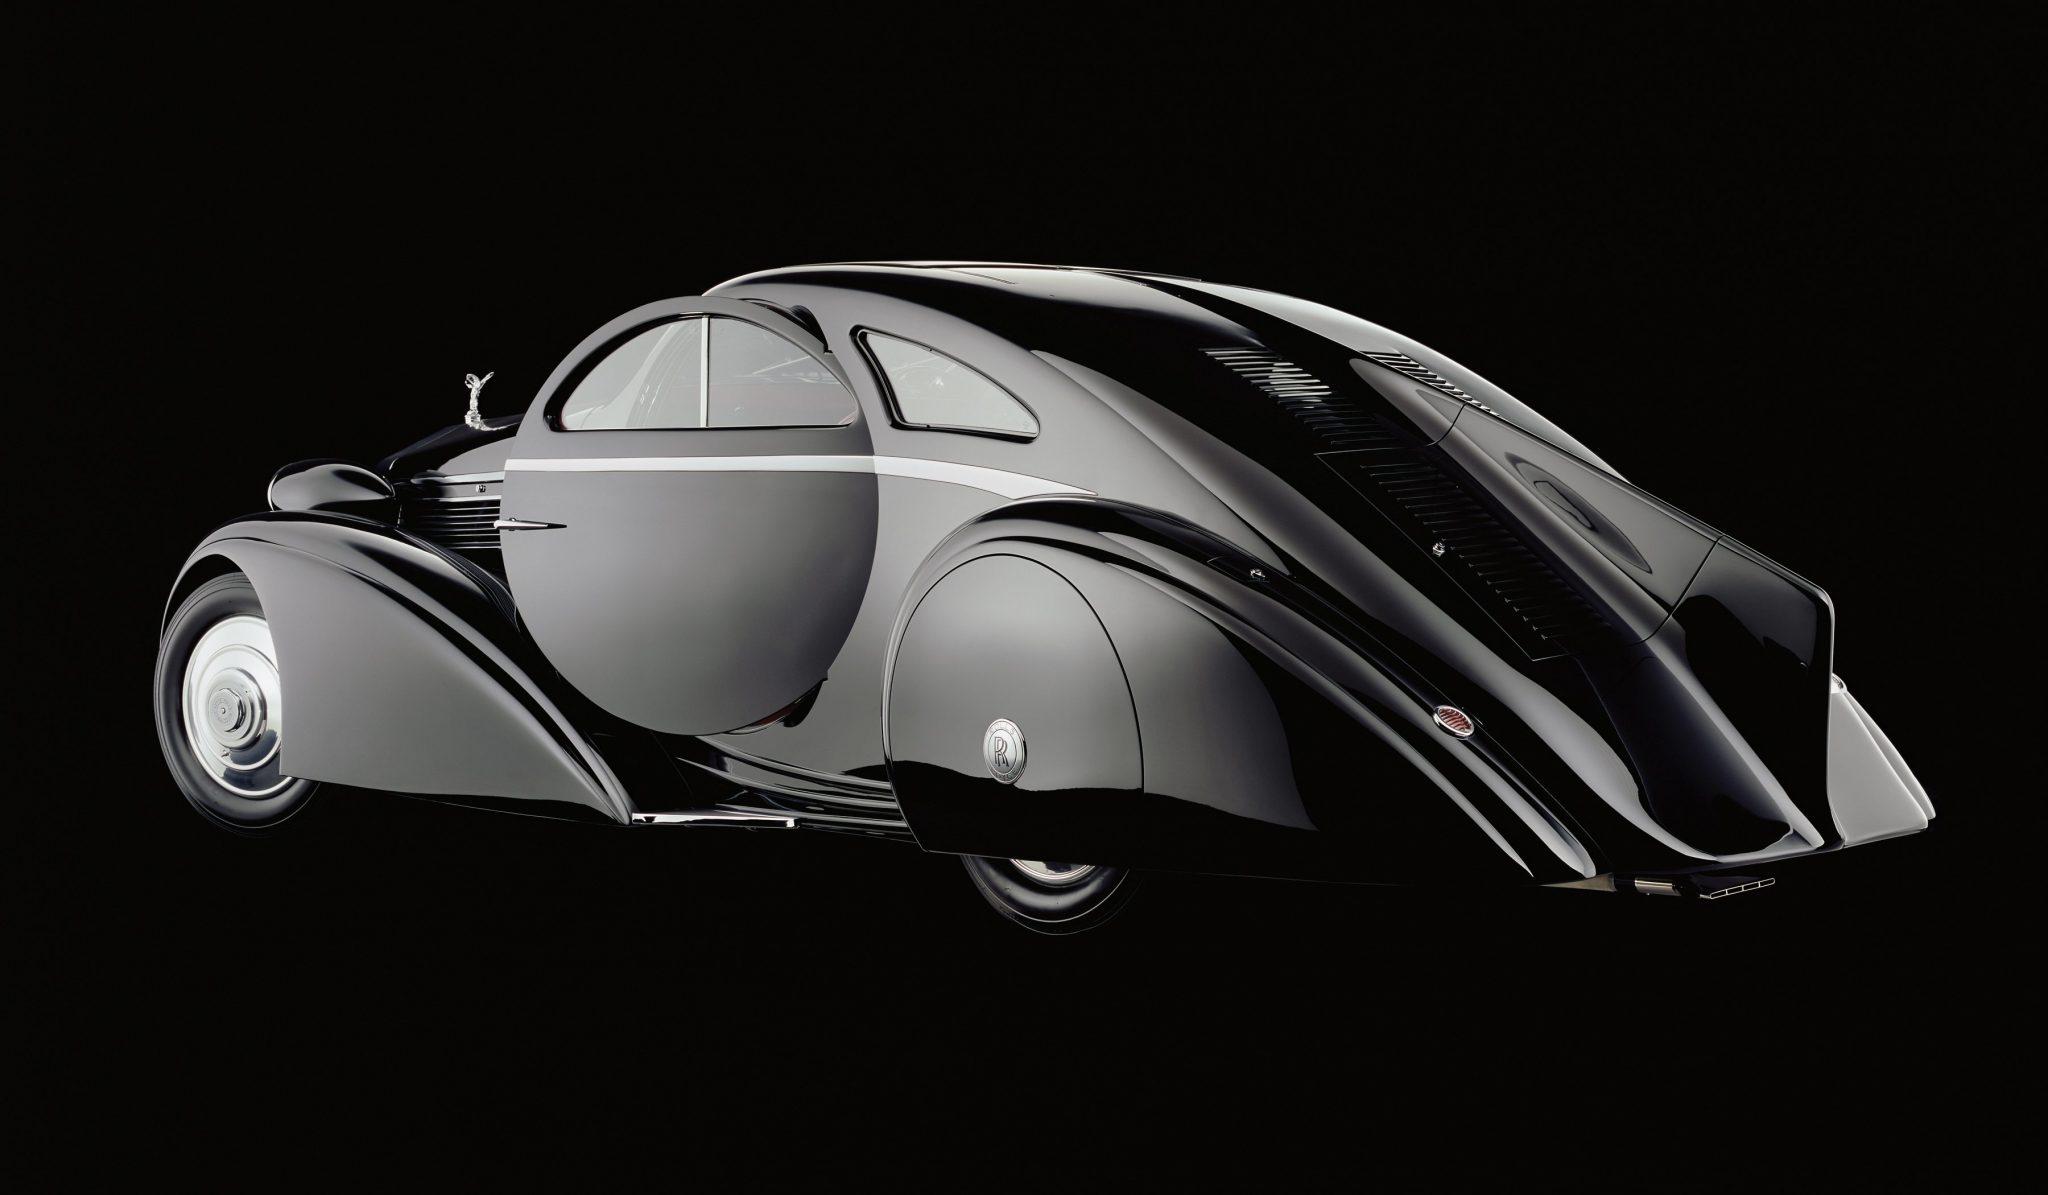 Royal Royce Car Hd Wallpaper The Round Door Rolls 1925 Rolls Royce Phantom I